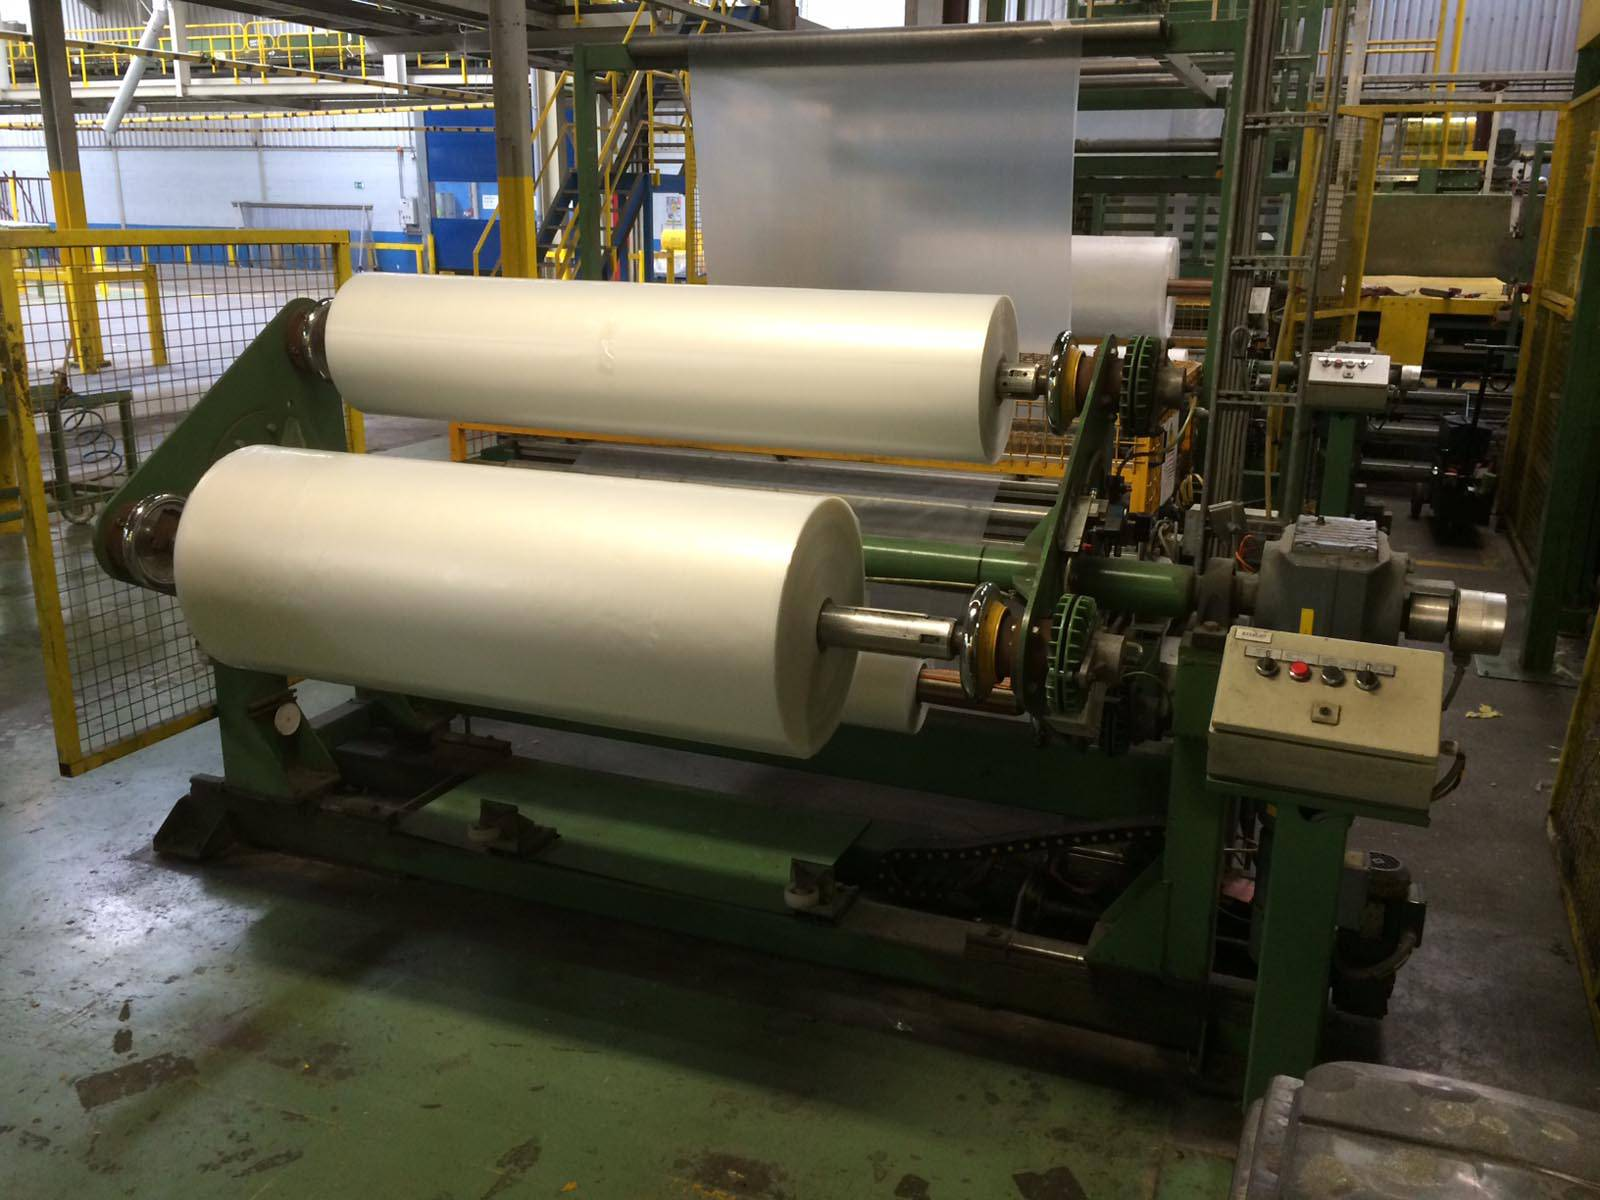 Machinebouw - Folie jukken   amtgroup.nl